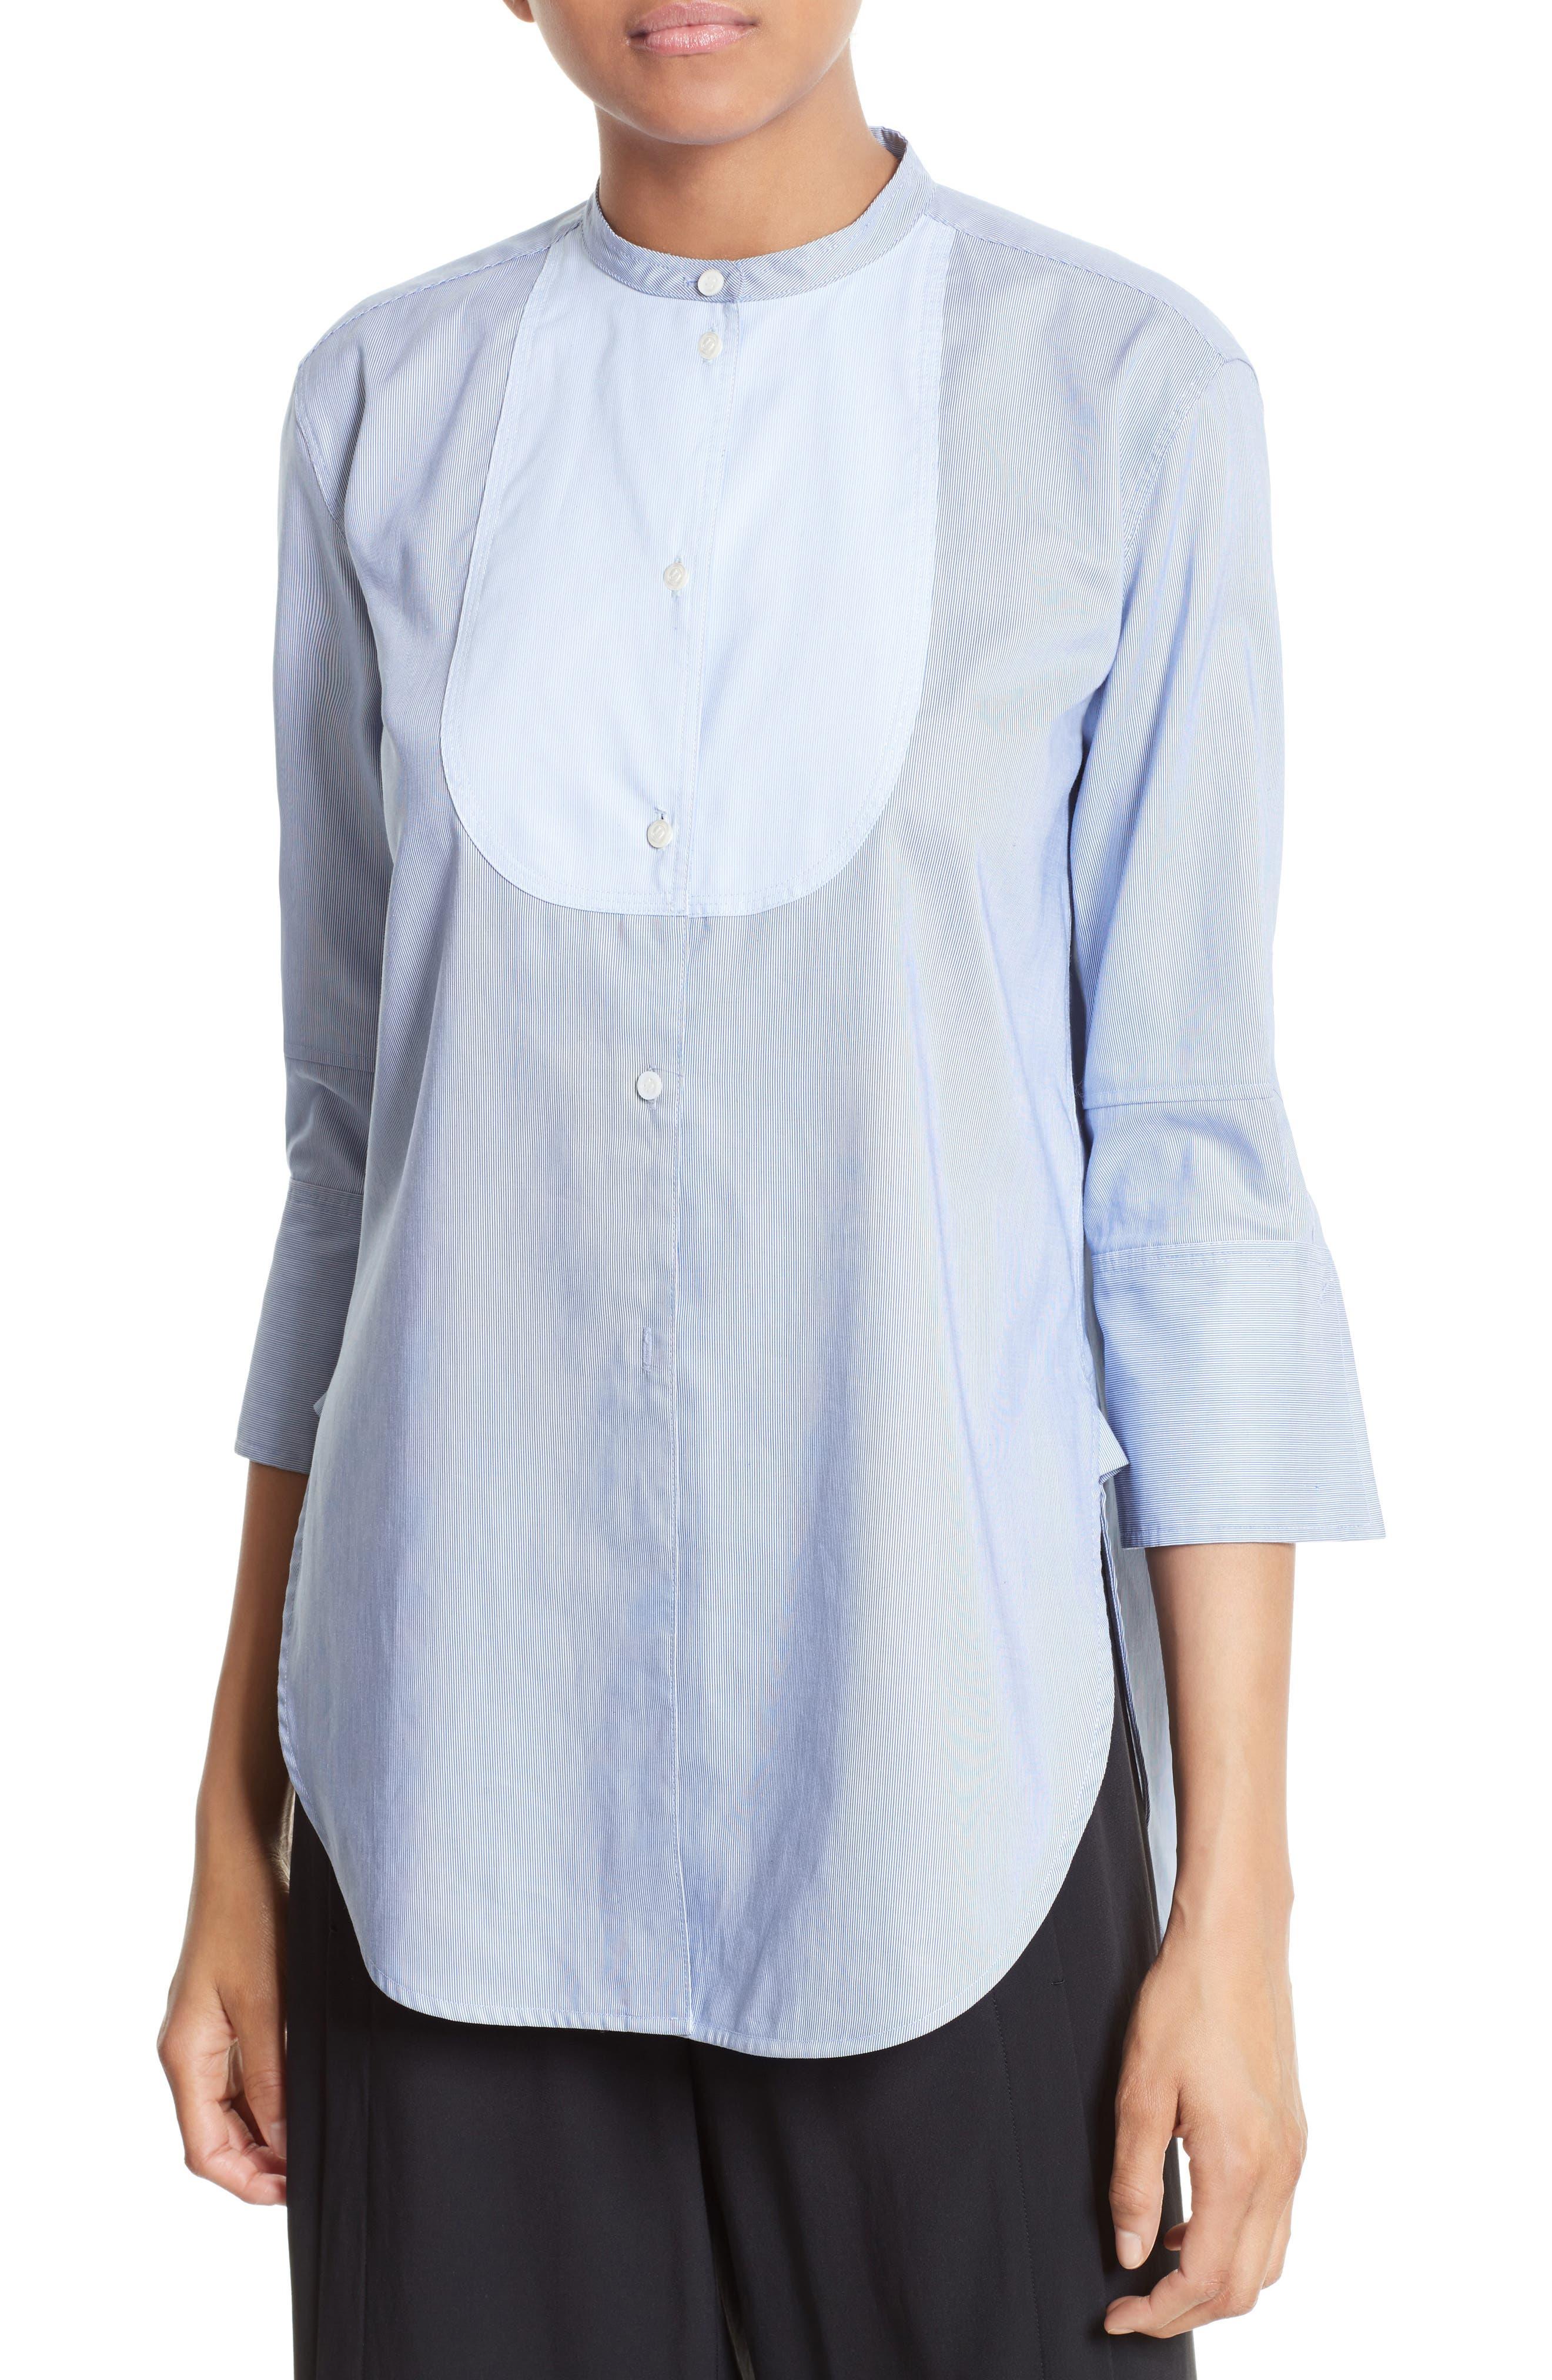 Main Image - Helmut Lang Ottoman Tuxedo Shirt